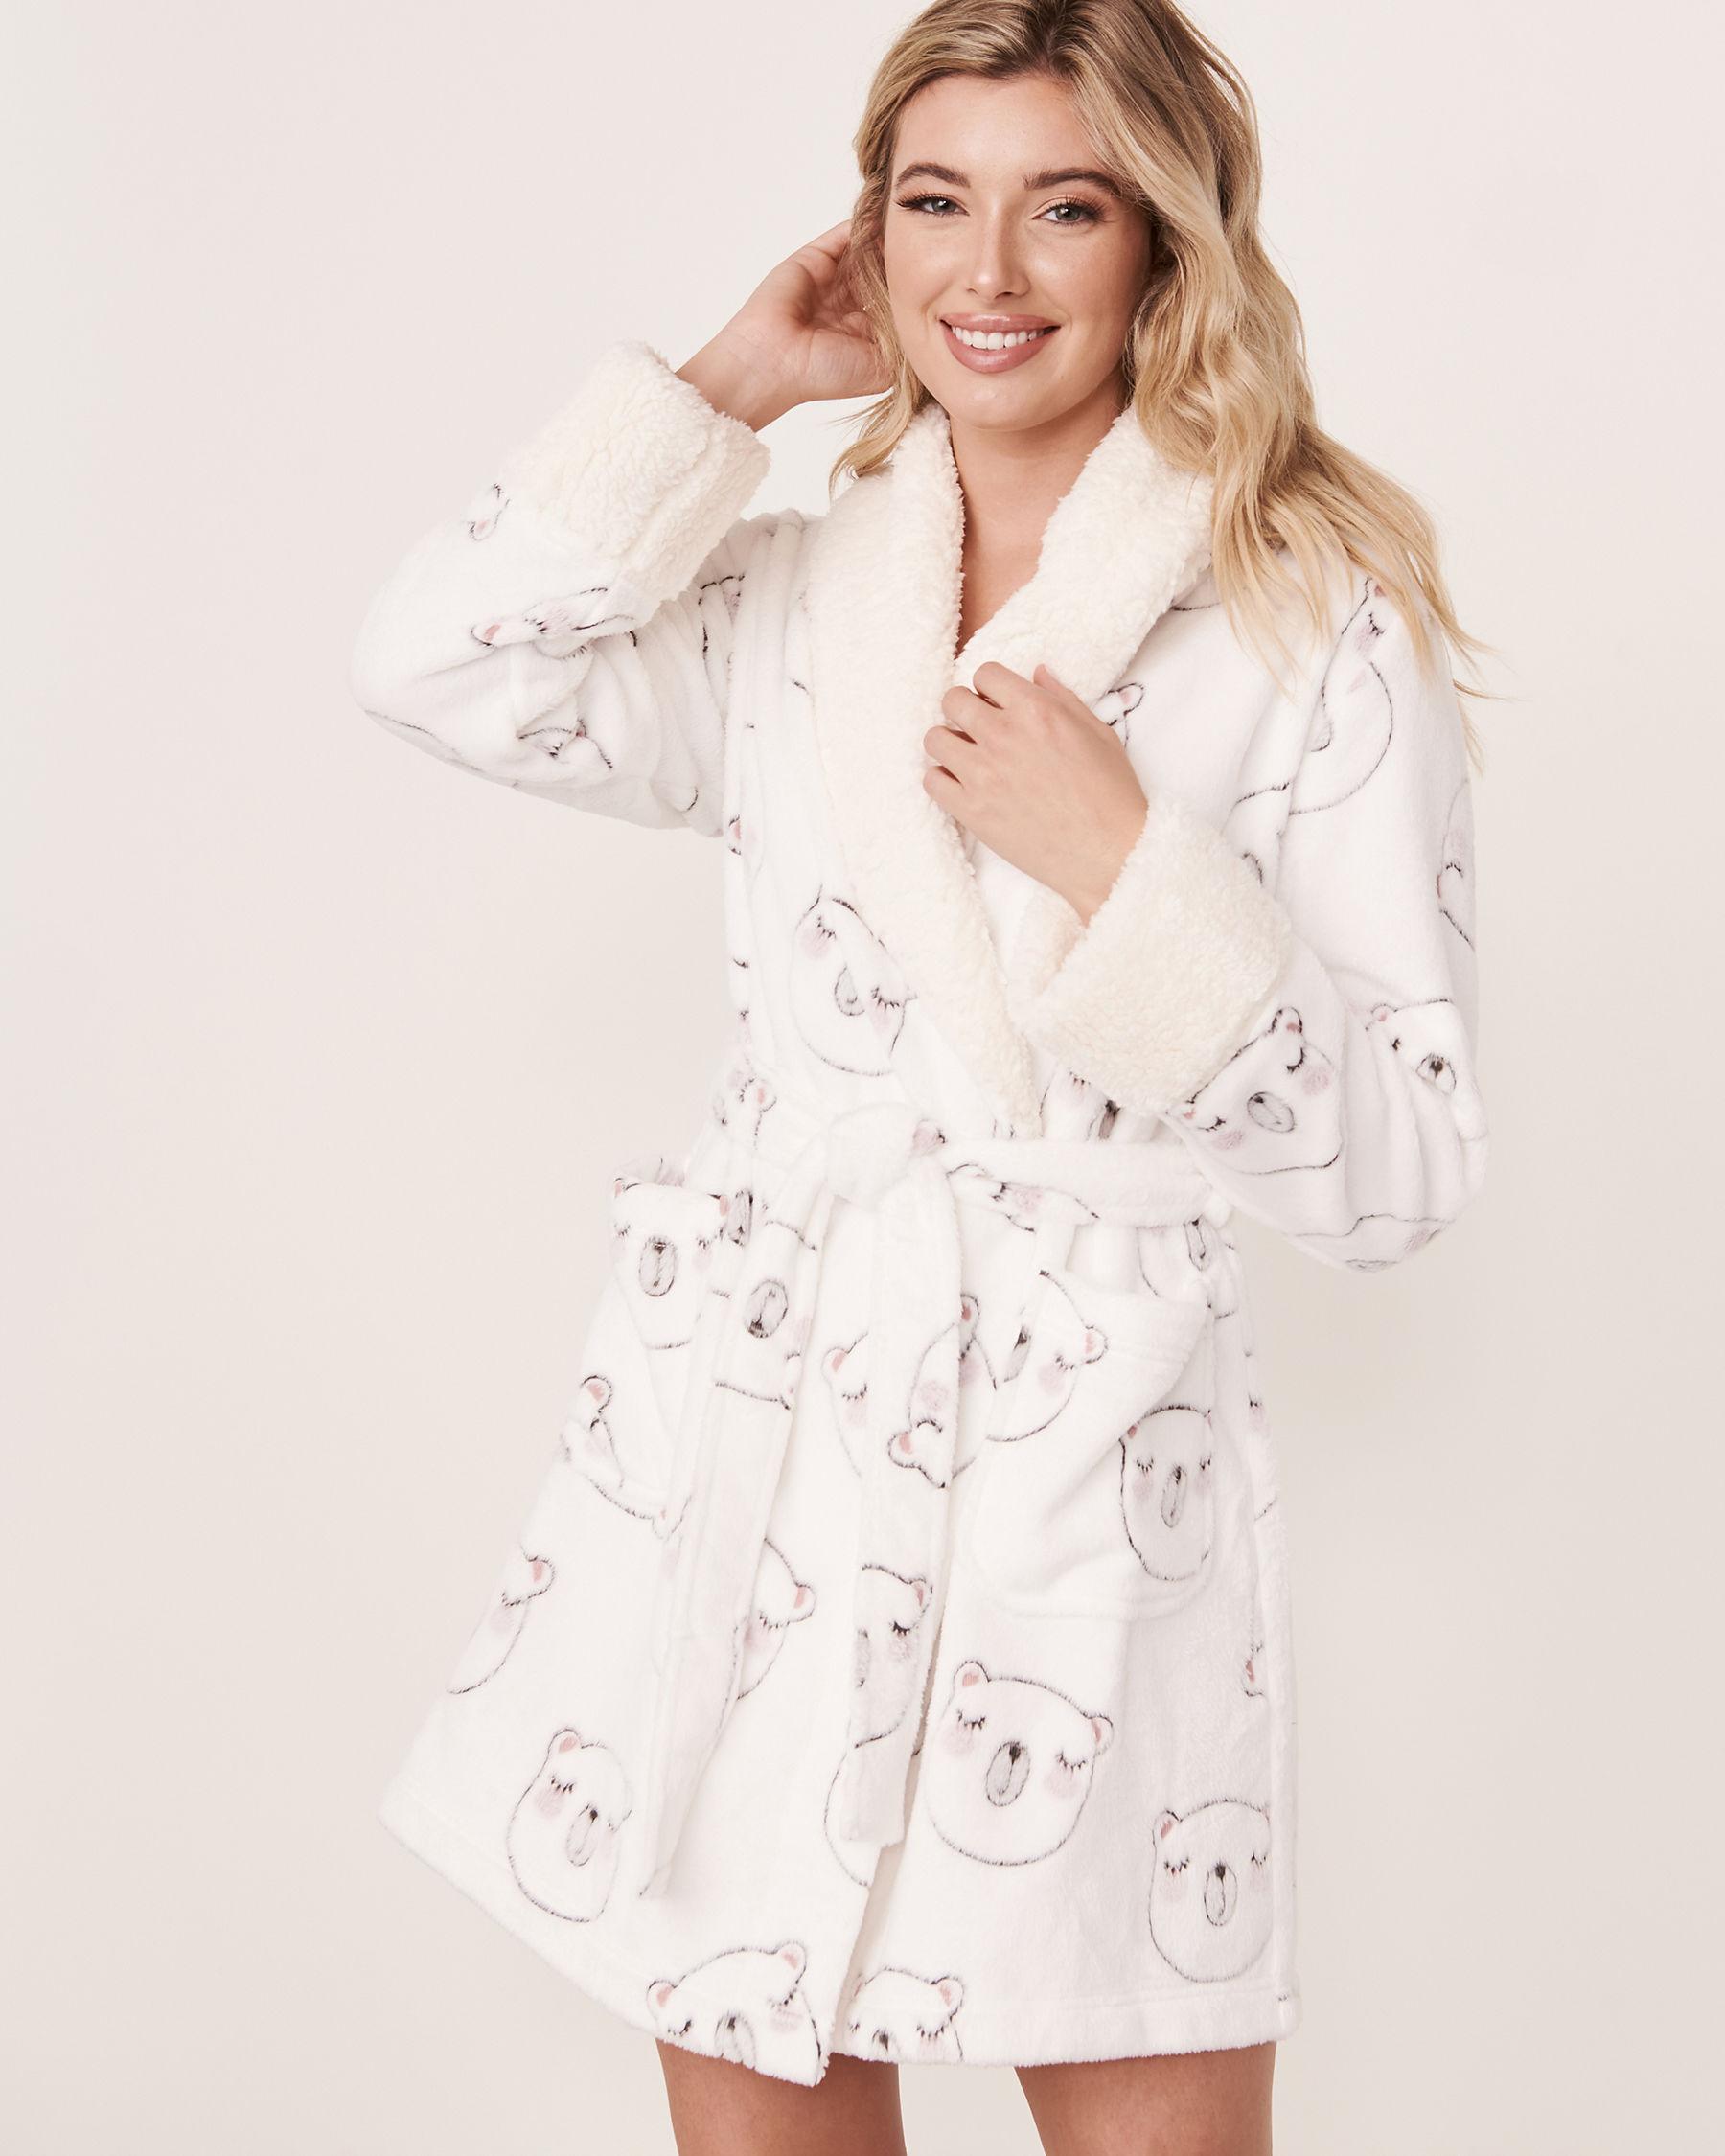 LA VIE EN ROSE Short Plush Robe Bear face 40600031 - View1